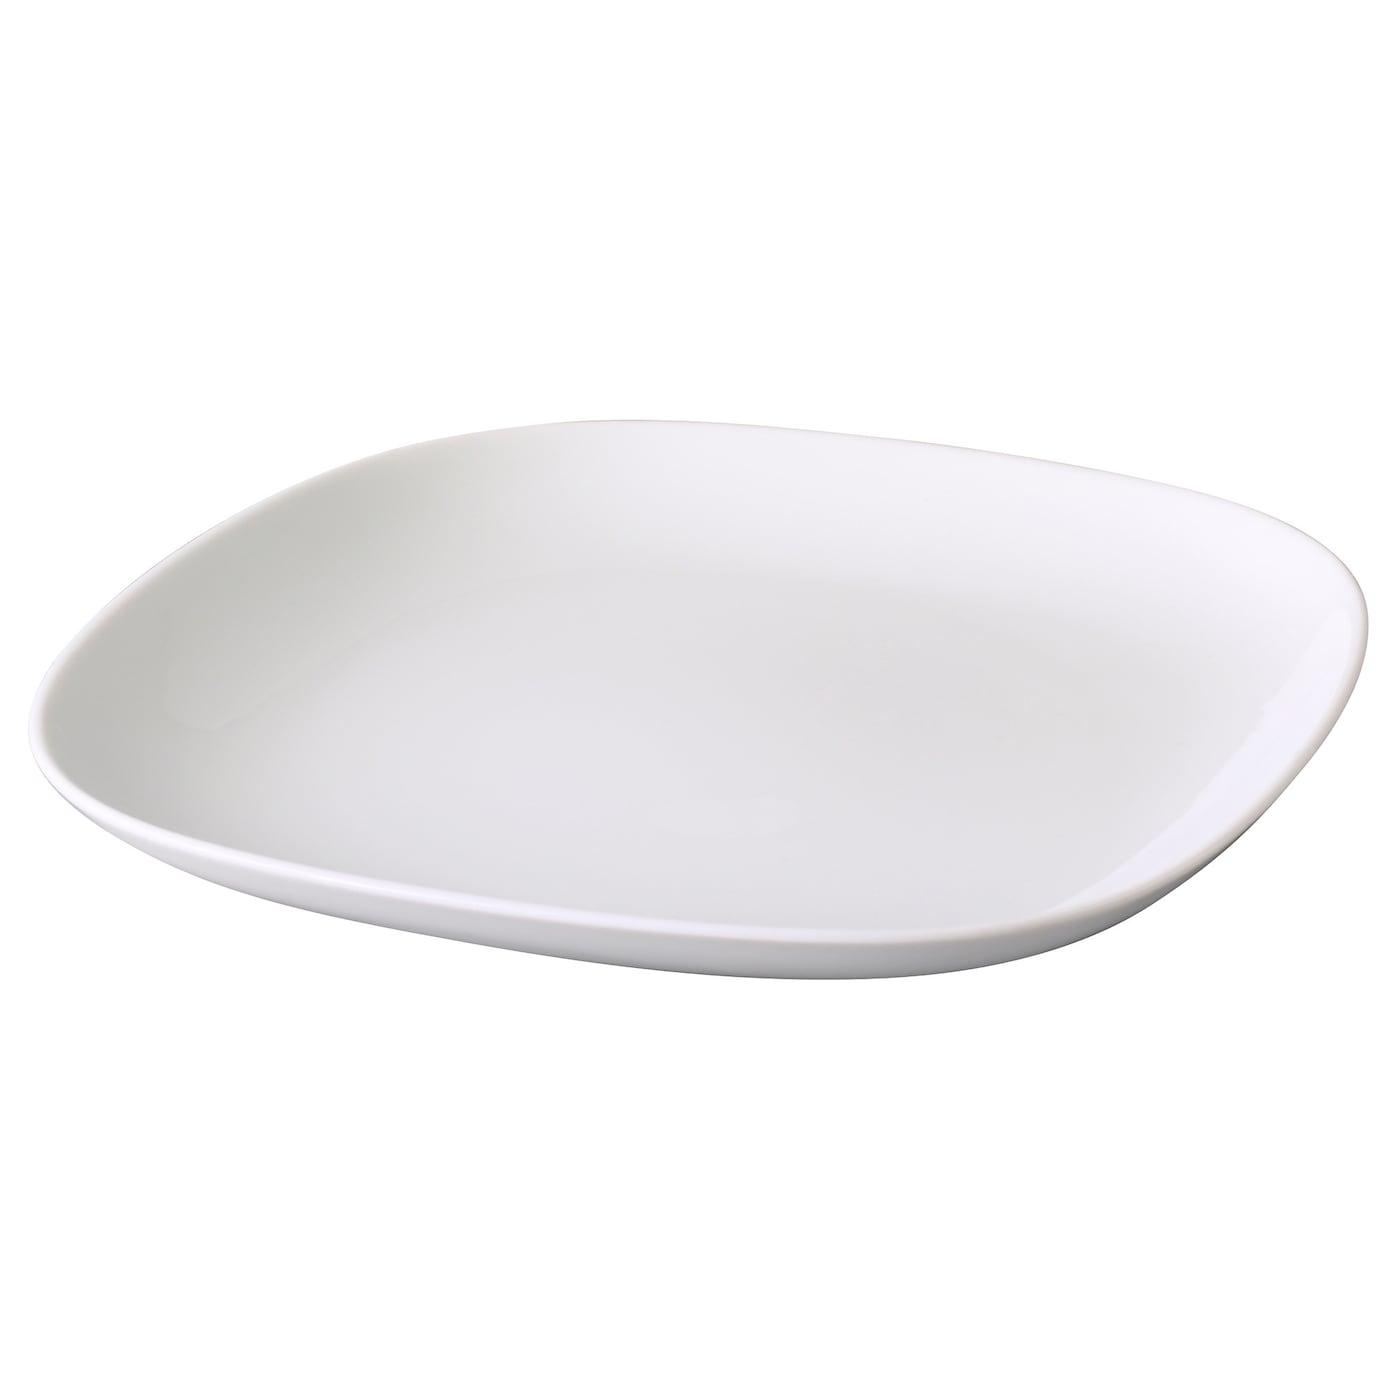 Ikea Shopping Bag Plates Dinner Plates Ikea